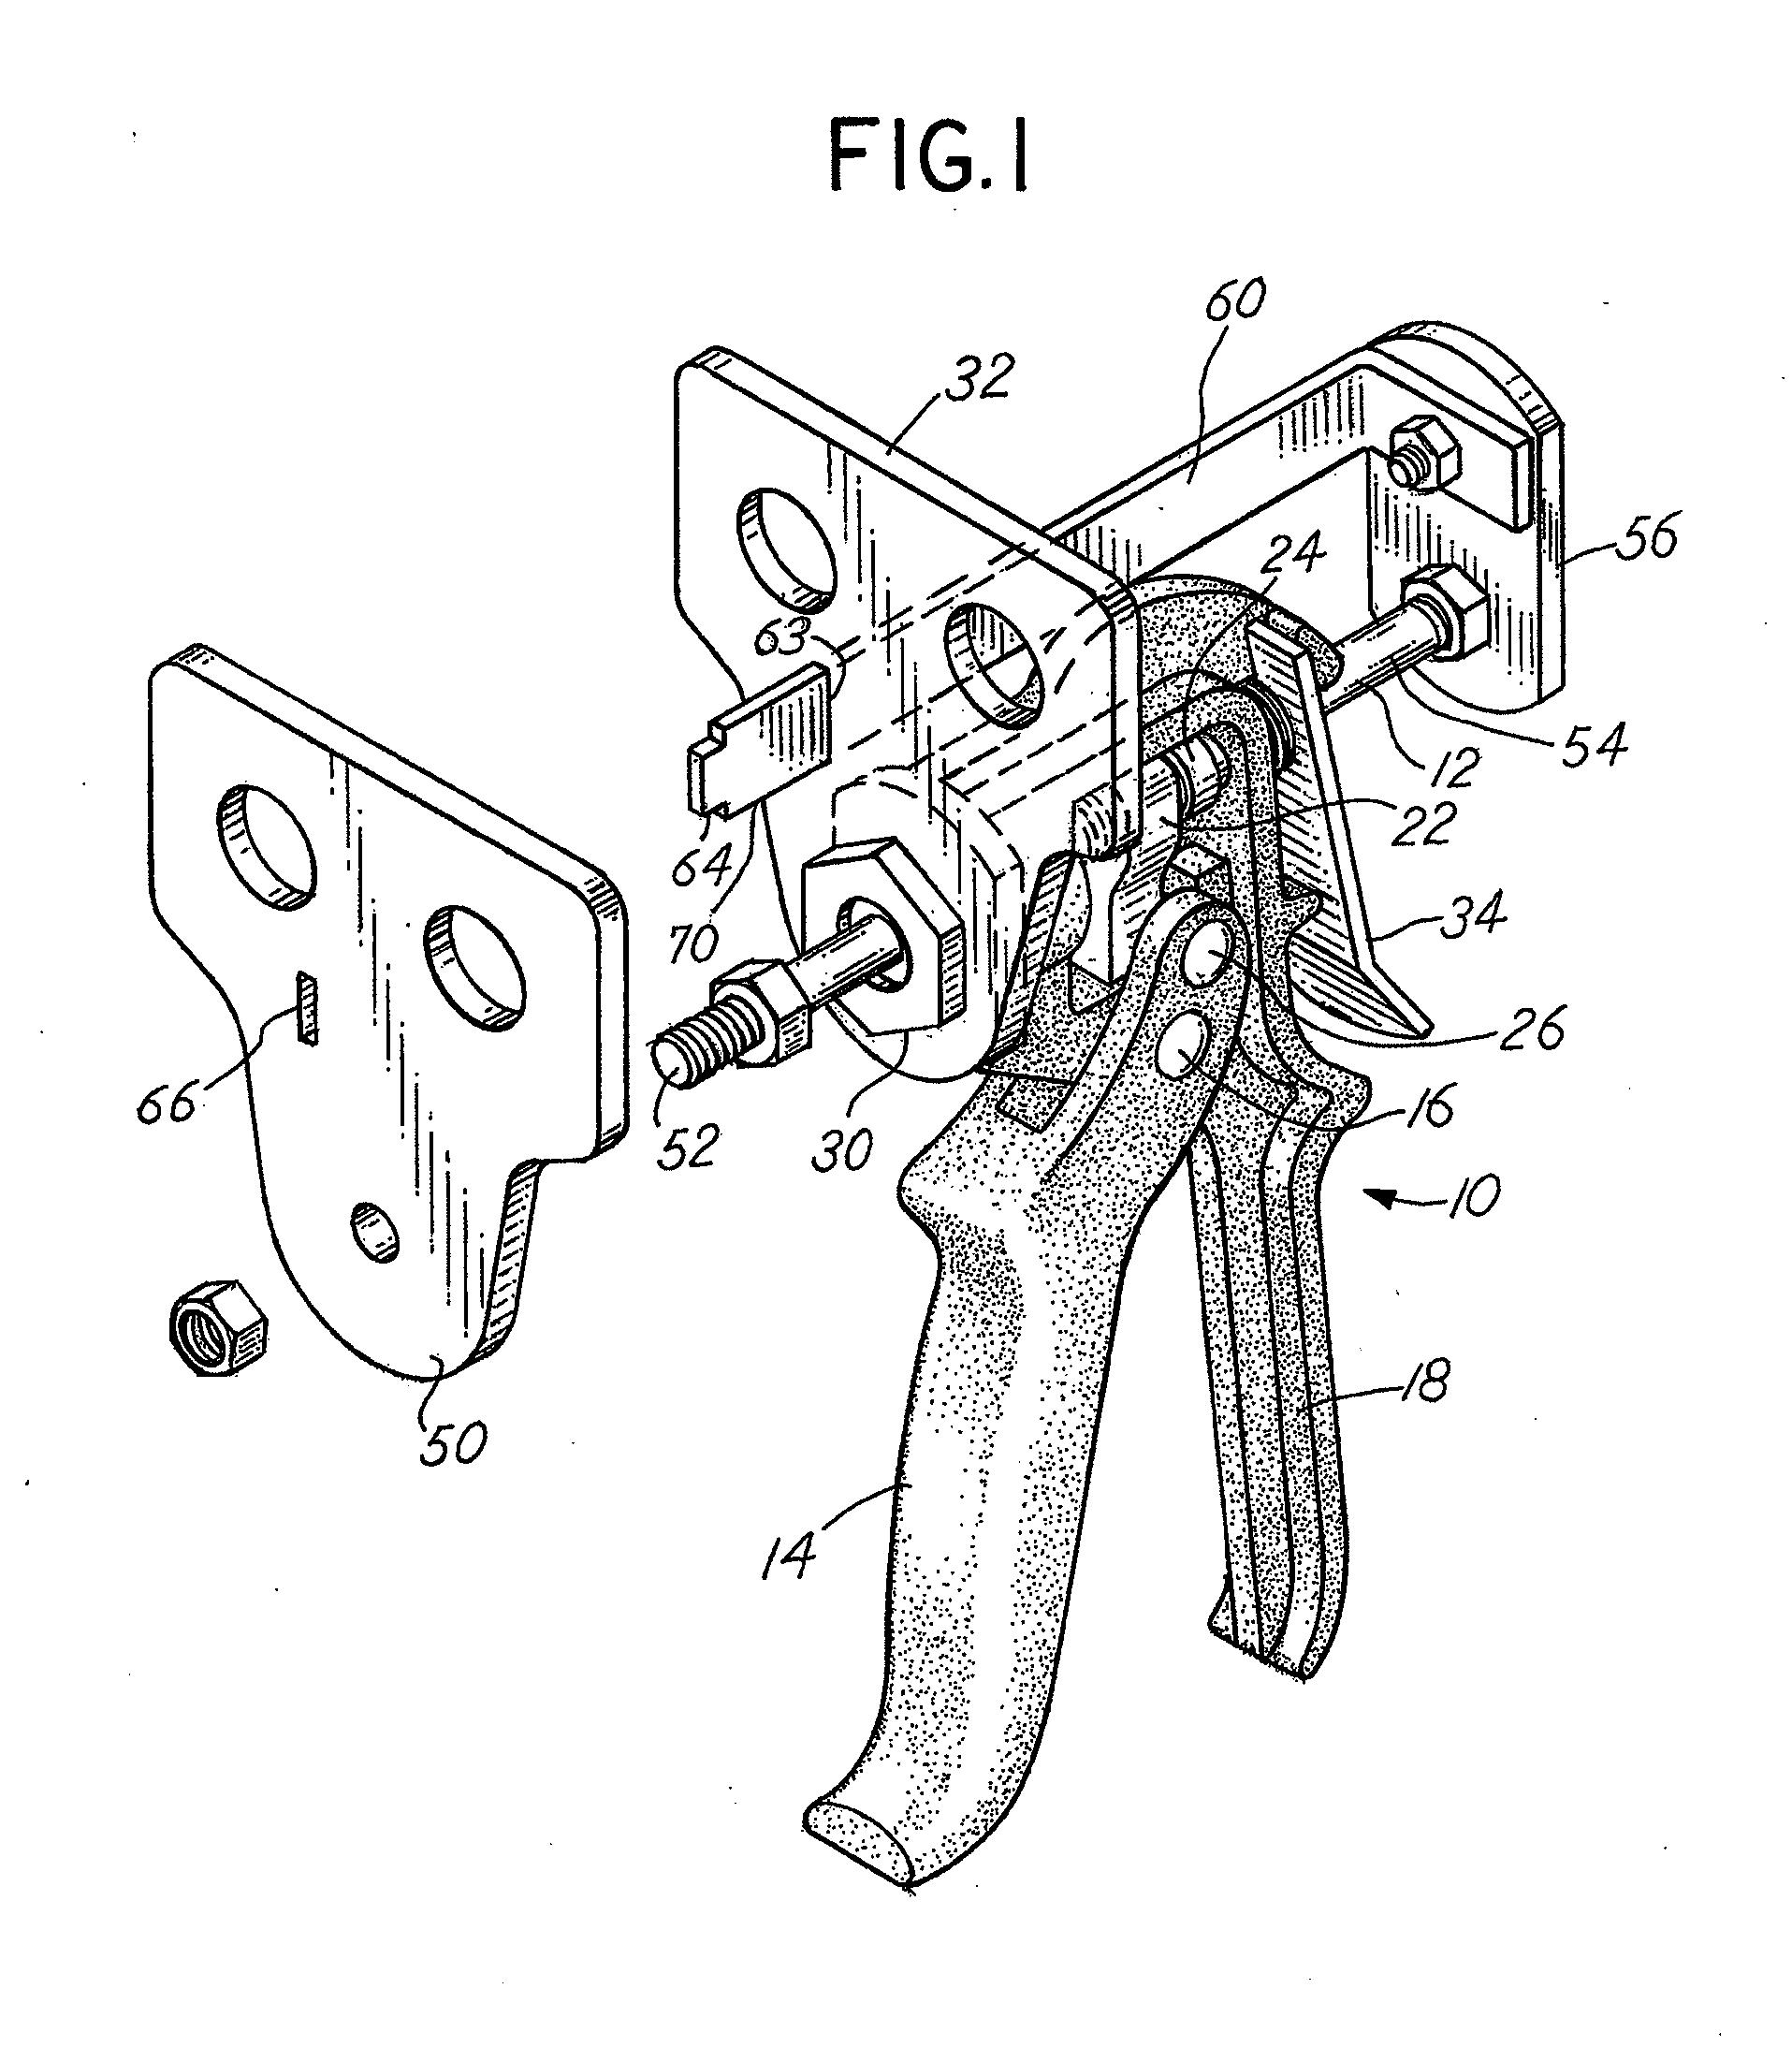 Yamaha outboard rigging parts 0406 gantt chart download